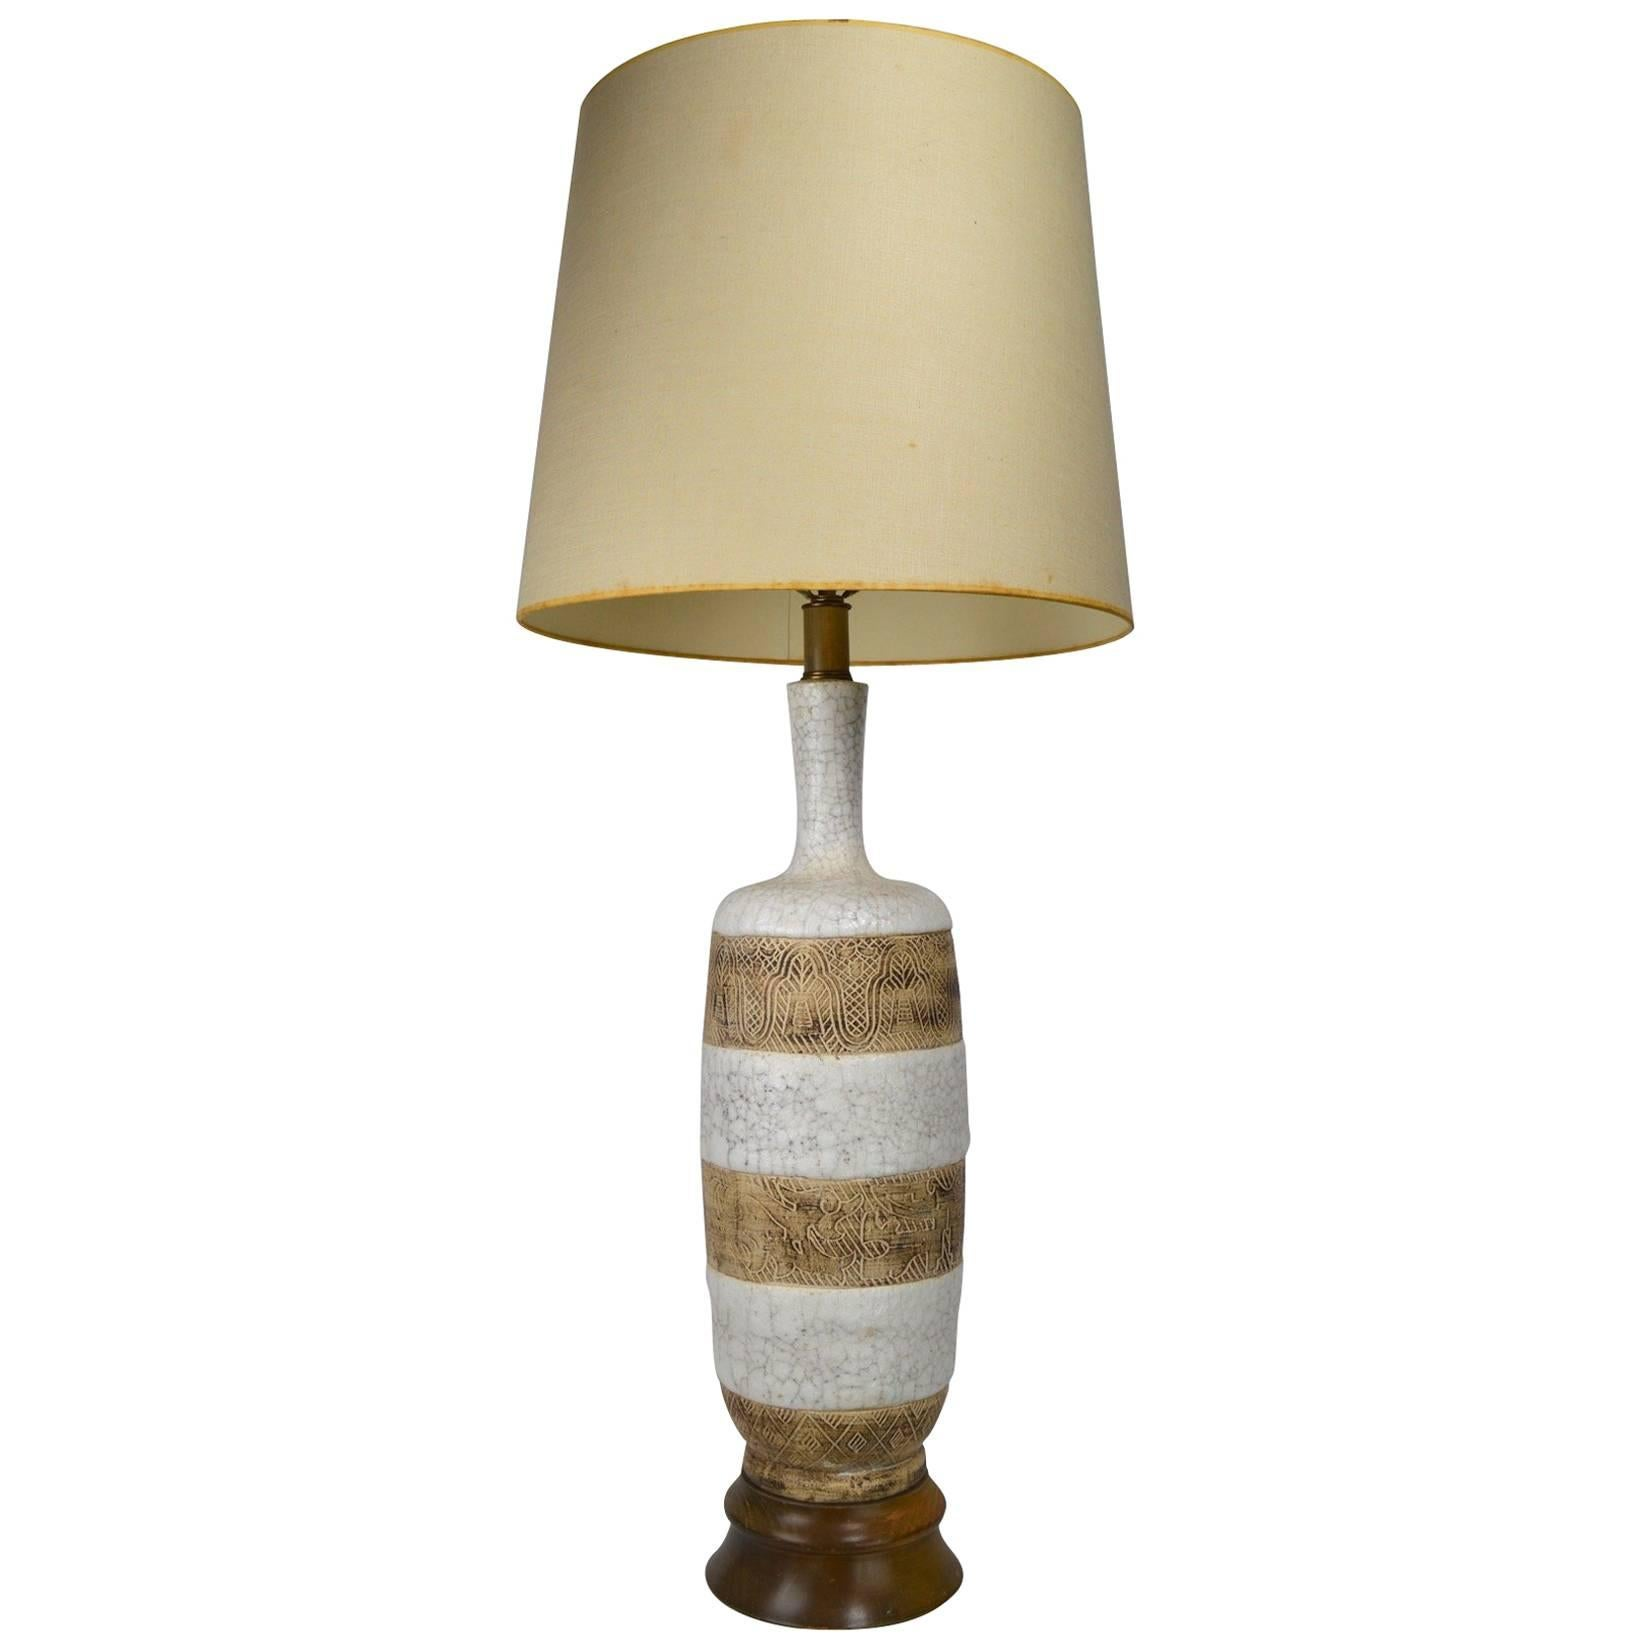 Italian Ceramic Lamp after Ugo Zaccagnini